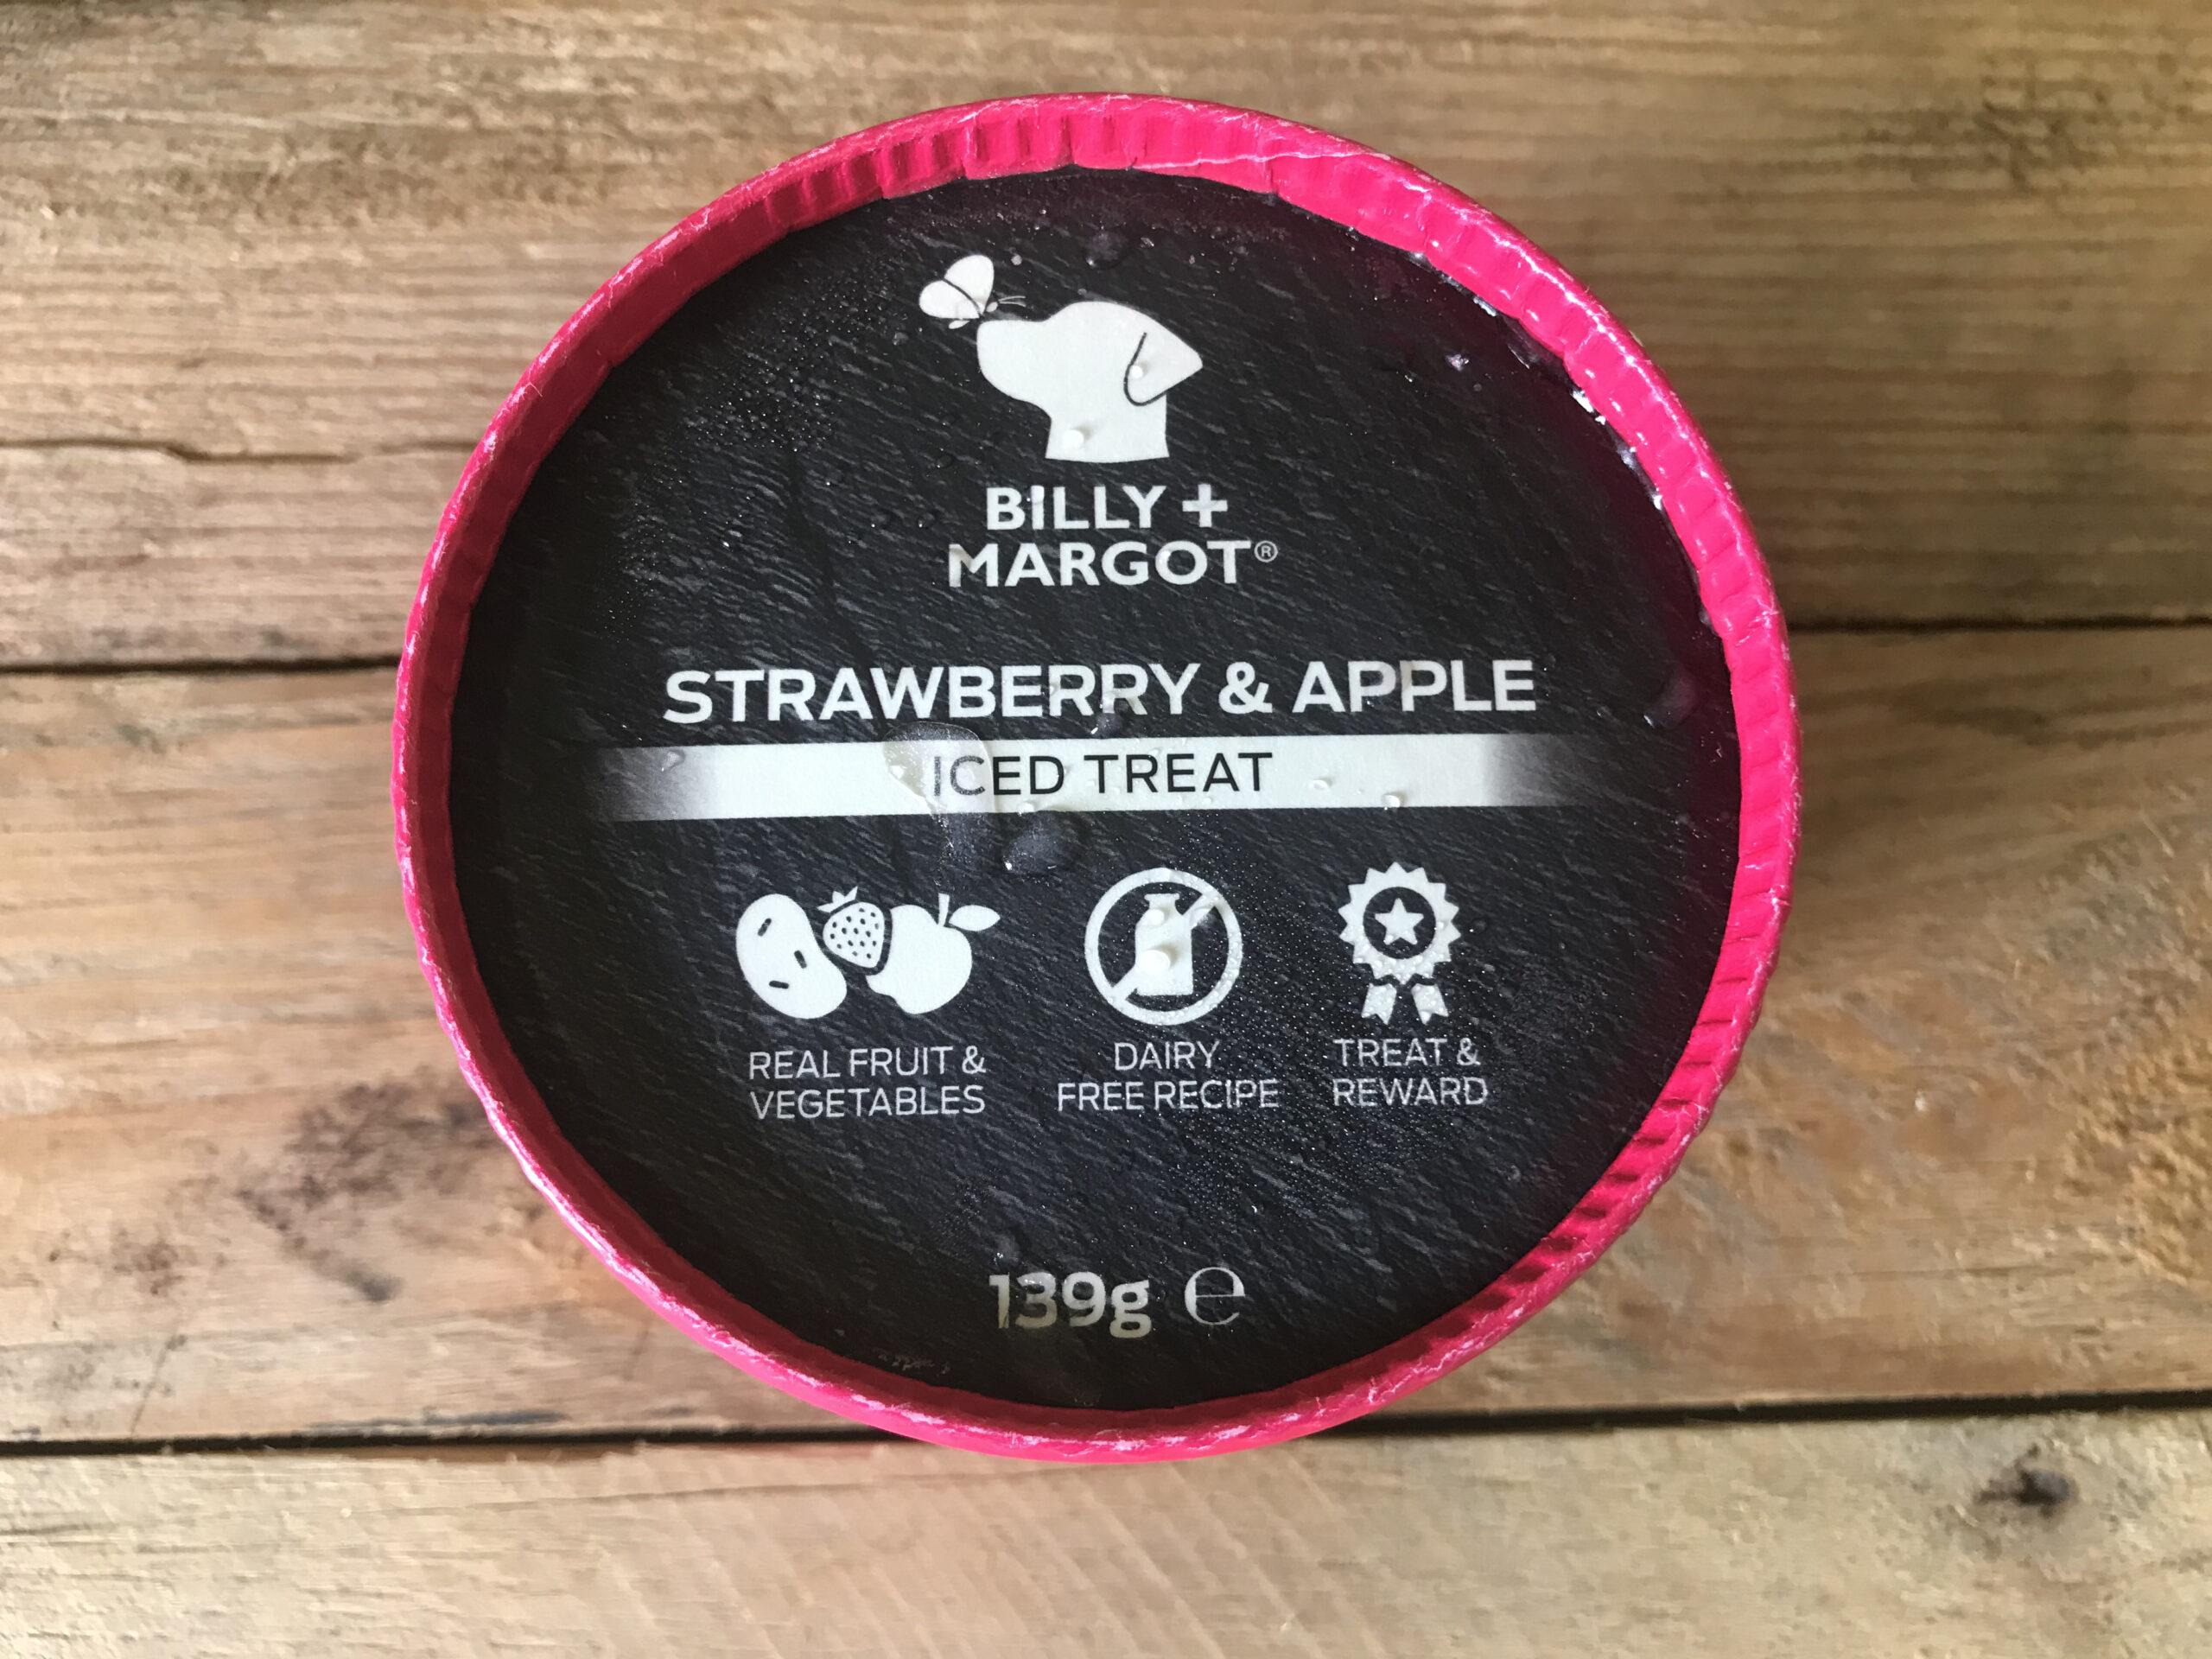 Billy + Margot Strawberry & Apple Iced Treat – 139g